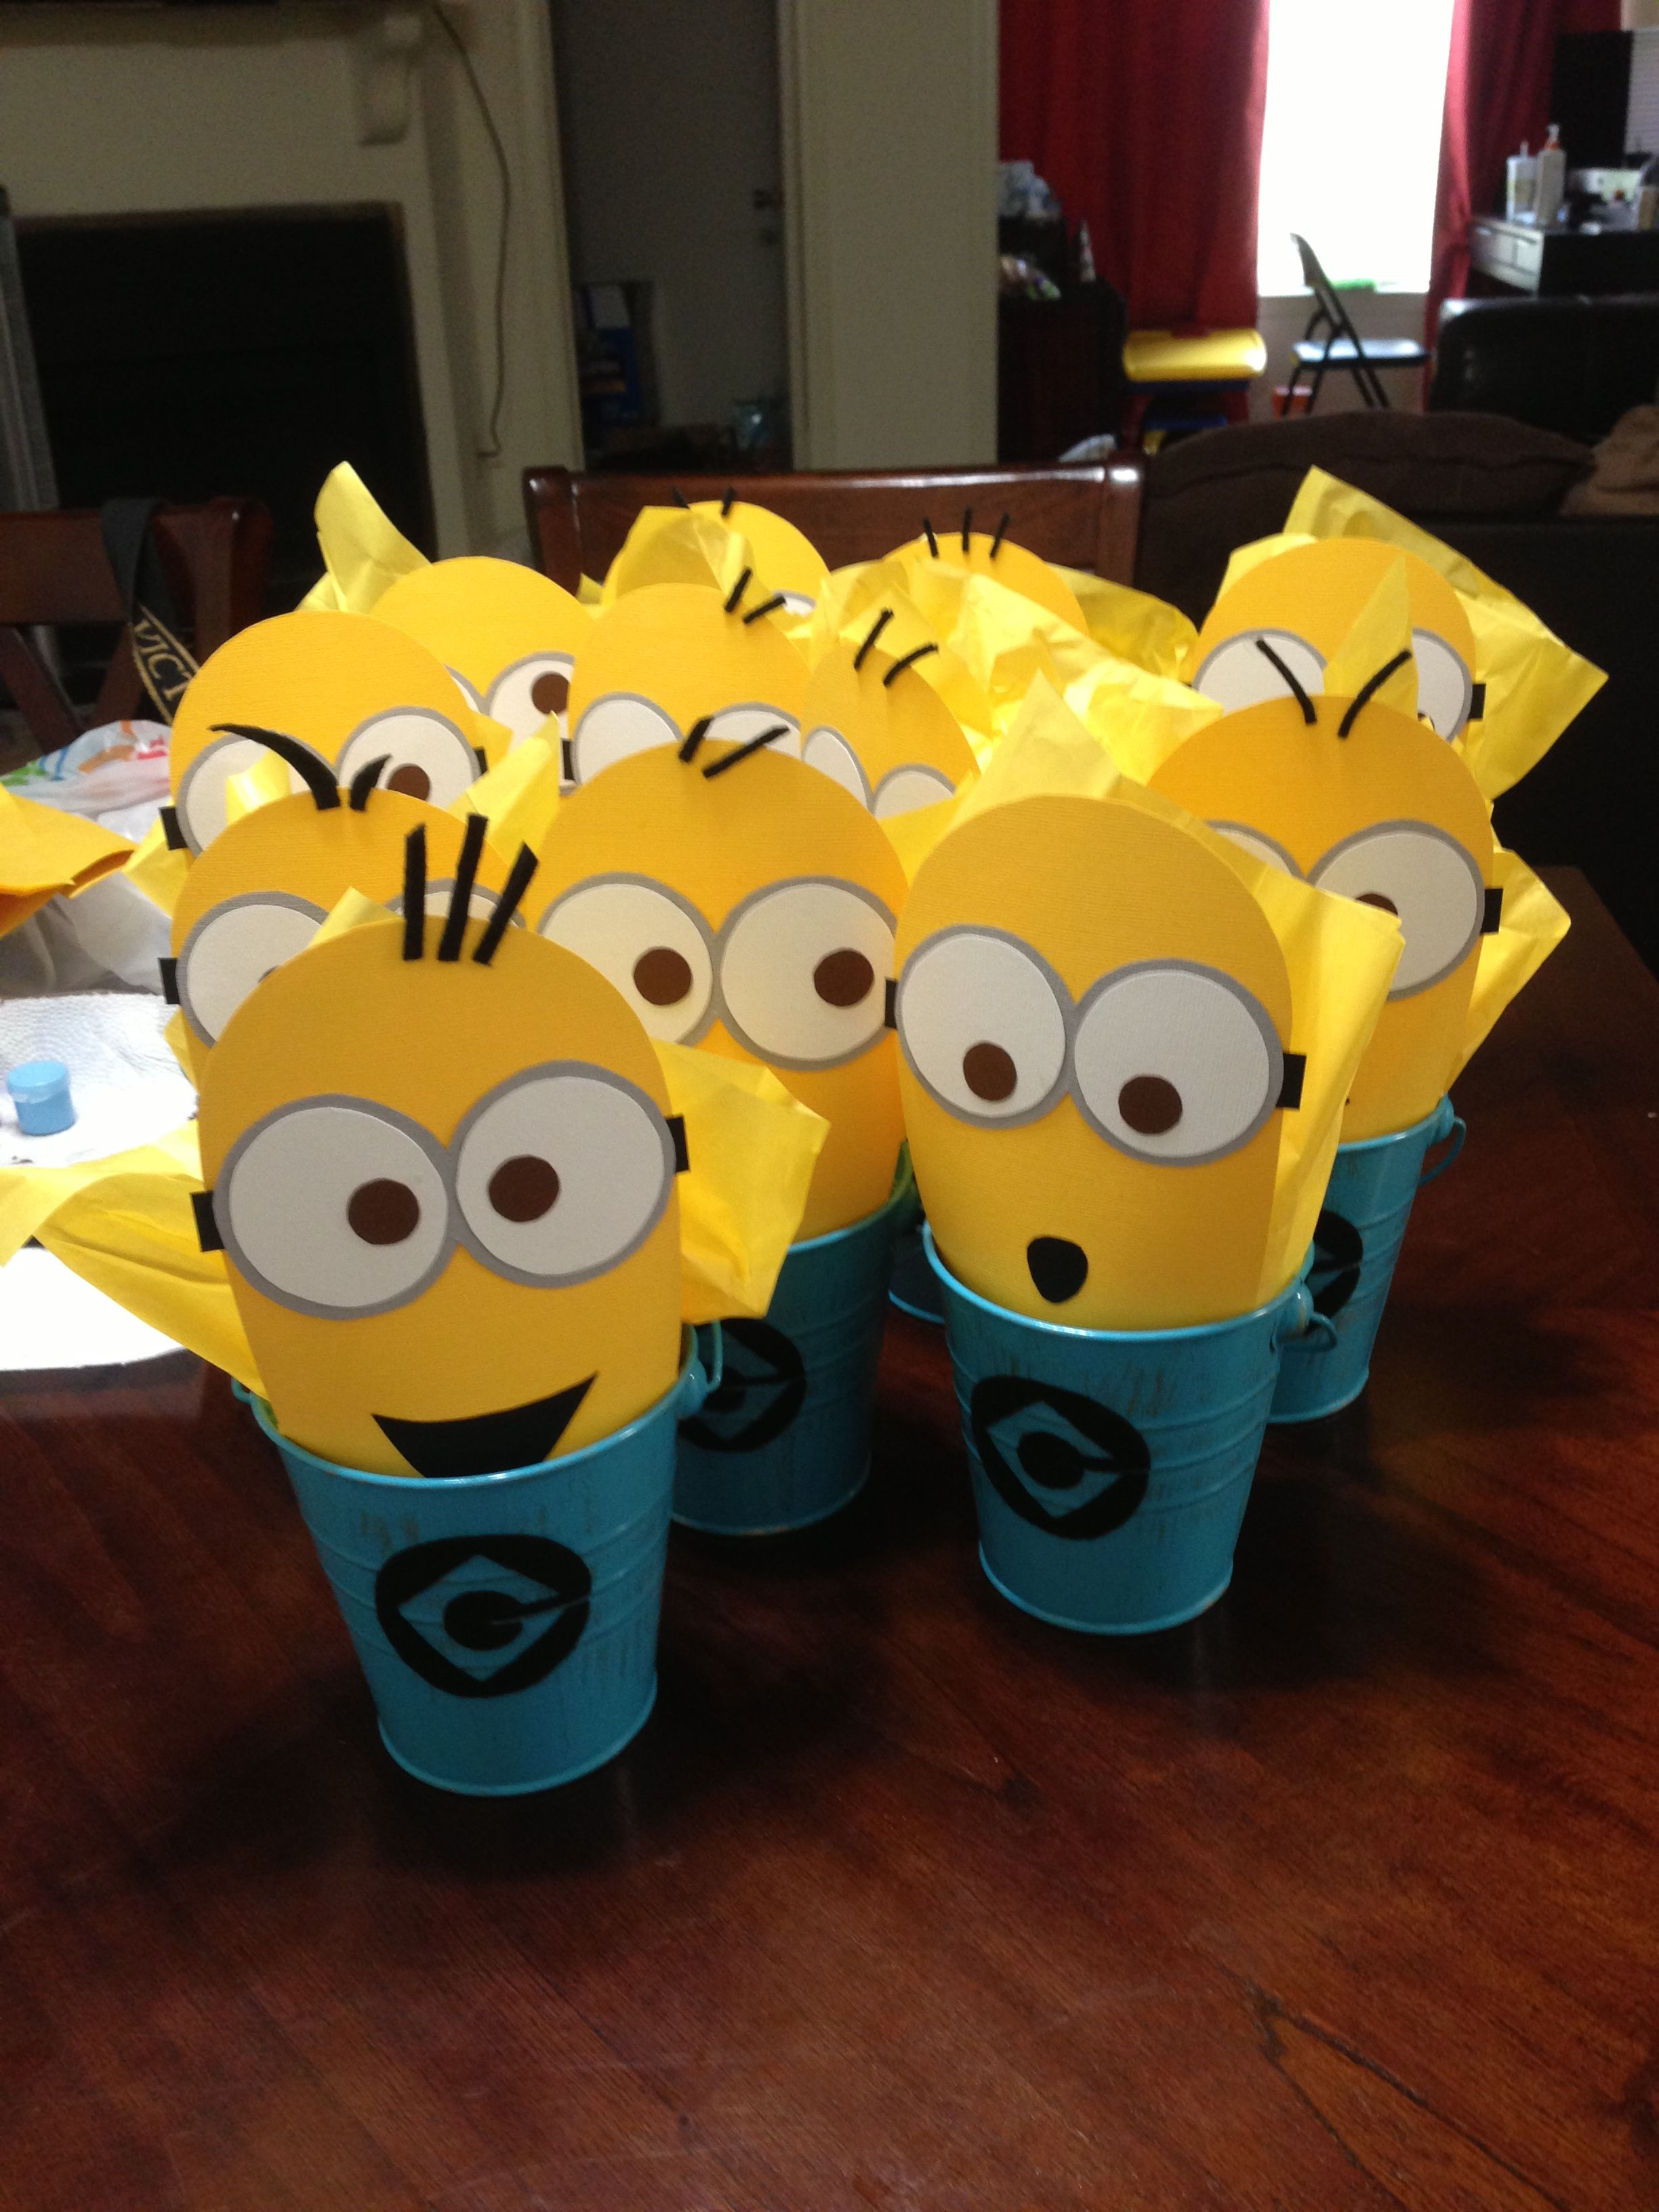 Despicable Me Minions Party Favors Filled With Candy For The Little Ones Blue Distressed Metal Pail Minions Avec Images Anniversaire Minions Anniversaire Enfant Minions